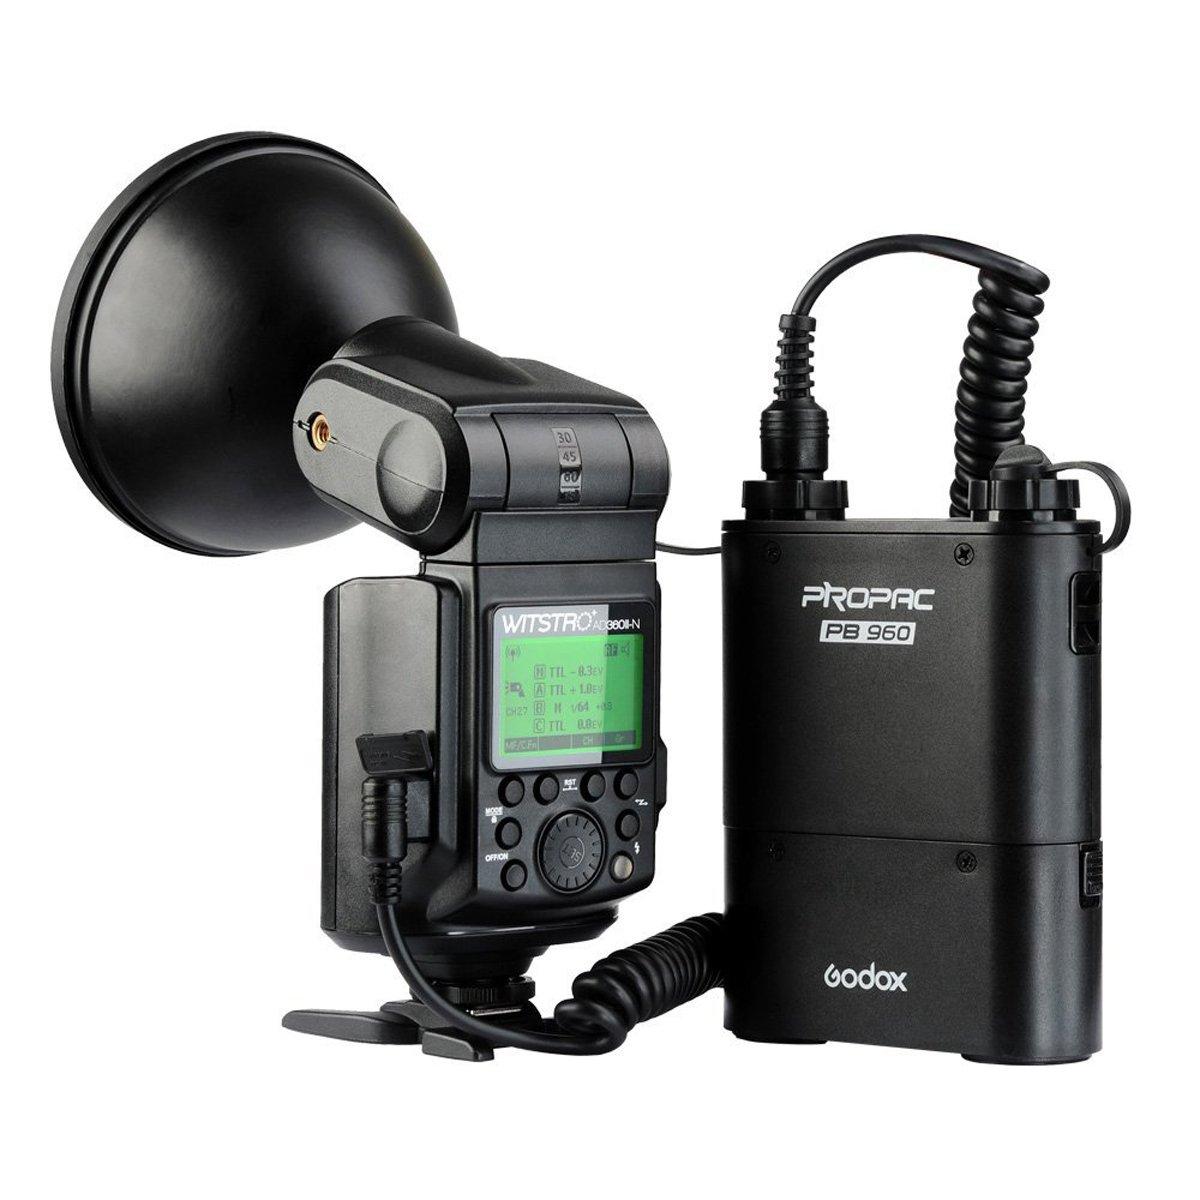 Godox AD360II-N 高出力スピードライトフラッシュ + PB960 4500mAh リチウムイオン電池キット ニコンカメラ用(ブラック)  AD360II-N kit black for Nikon B06XRY4BPN